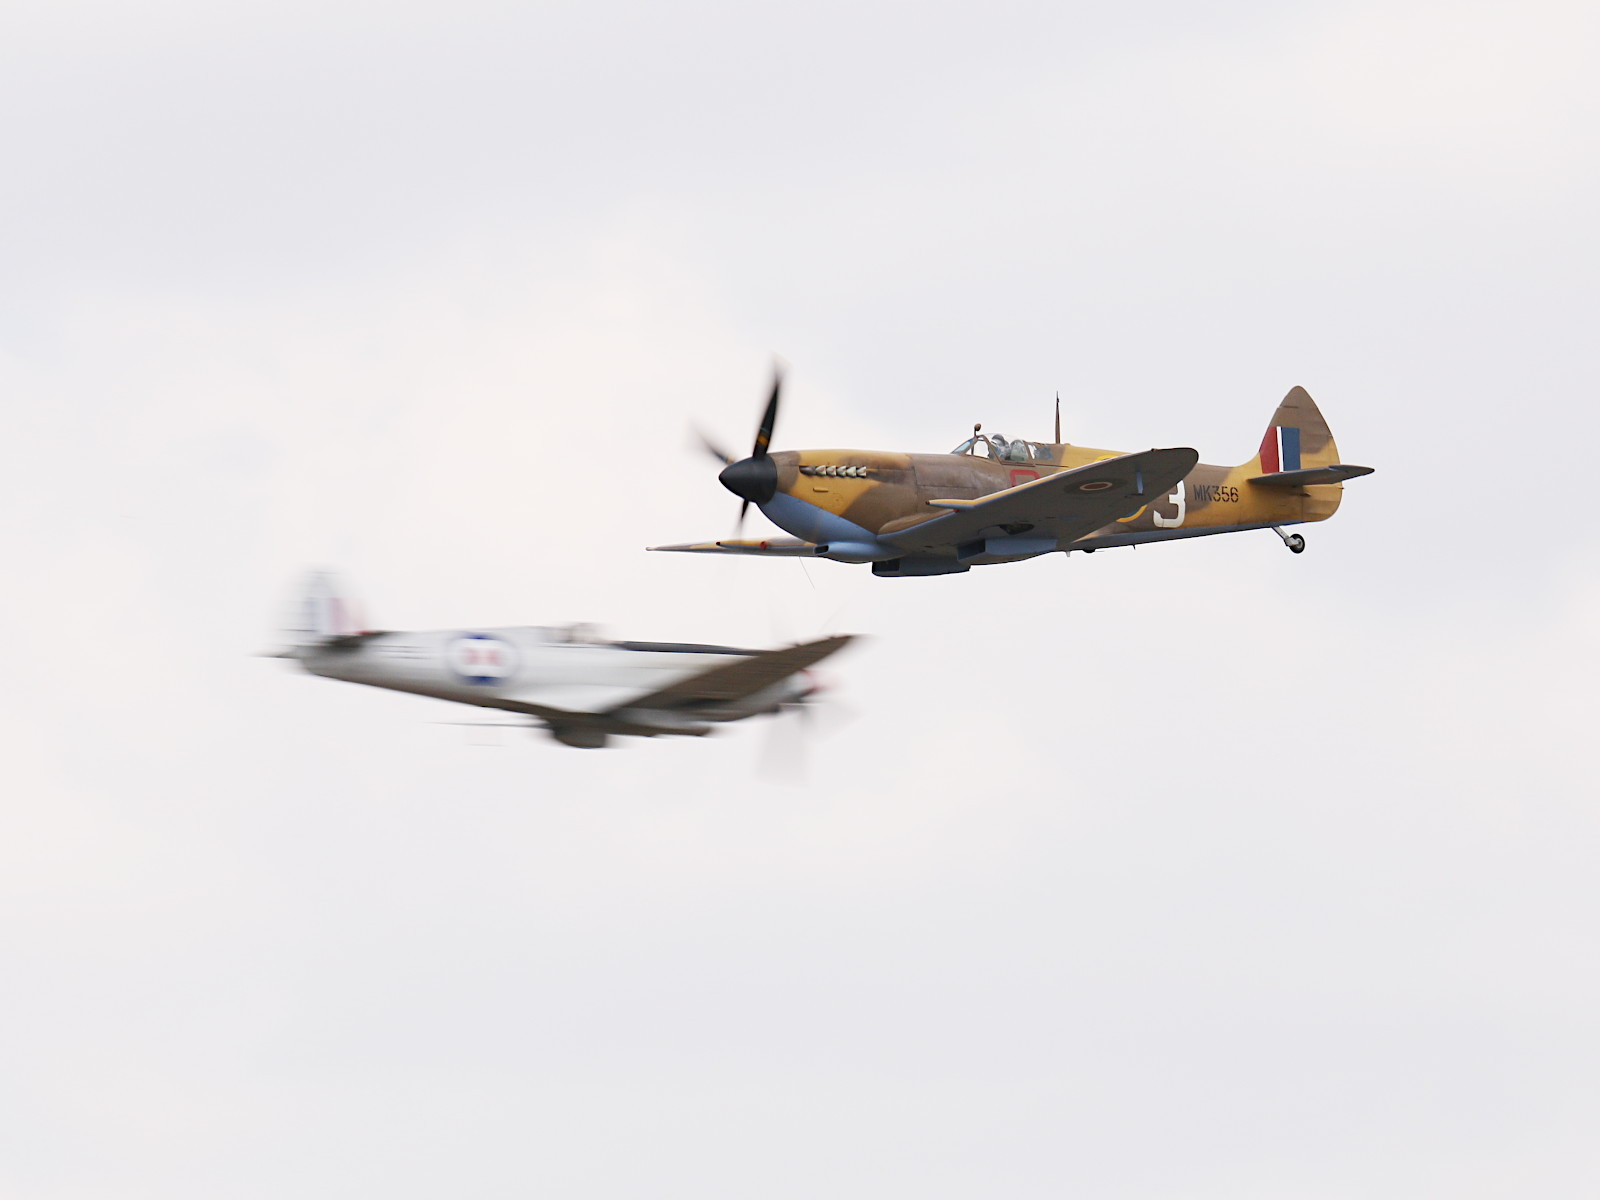 Supermarine Spitfire Crossing © Doppeladler.com